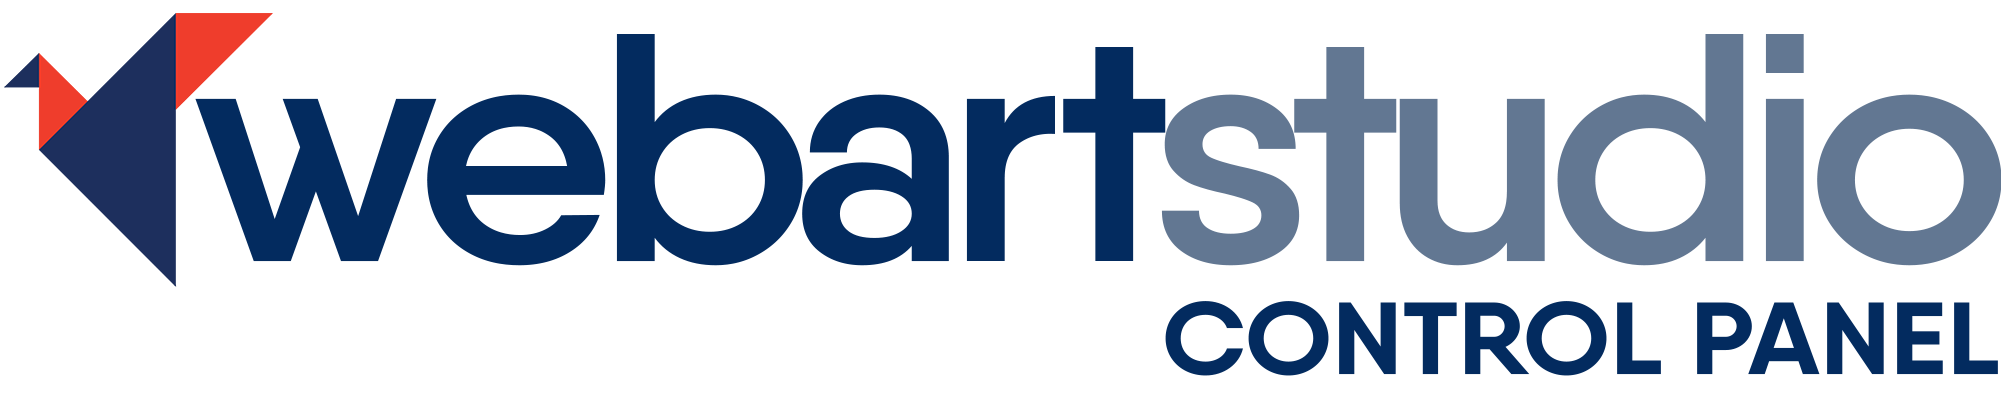 Webartstudio